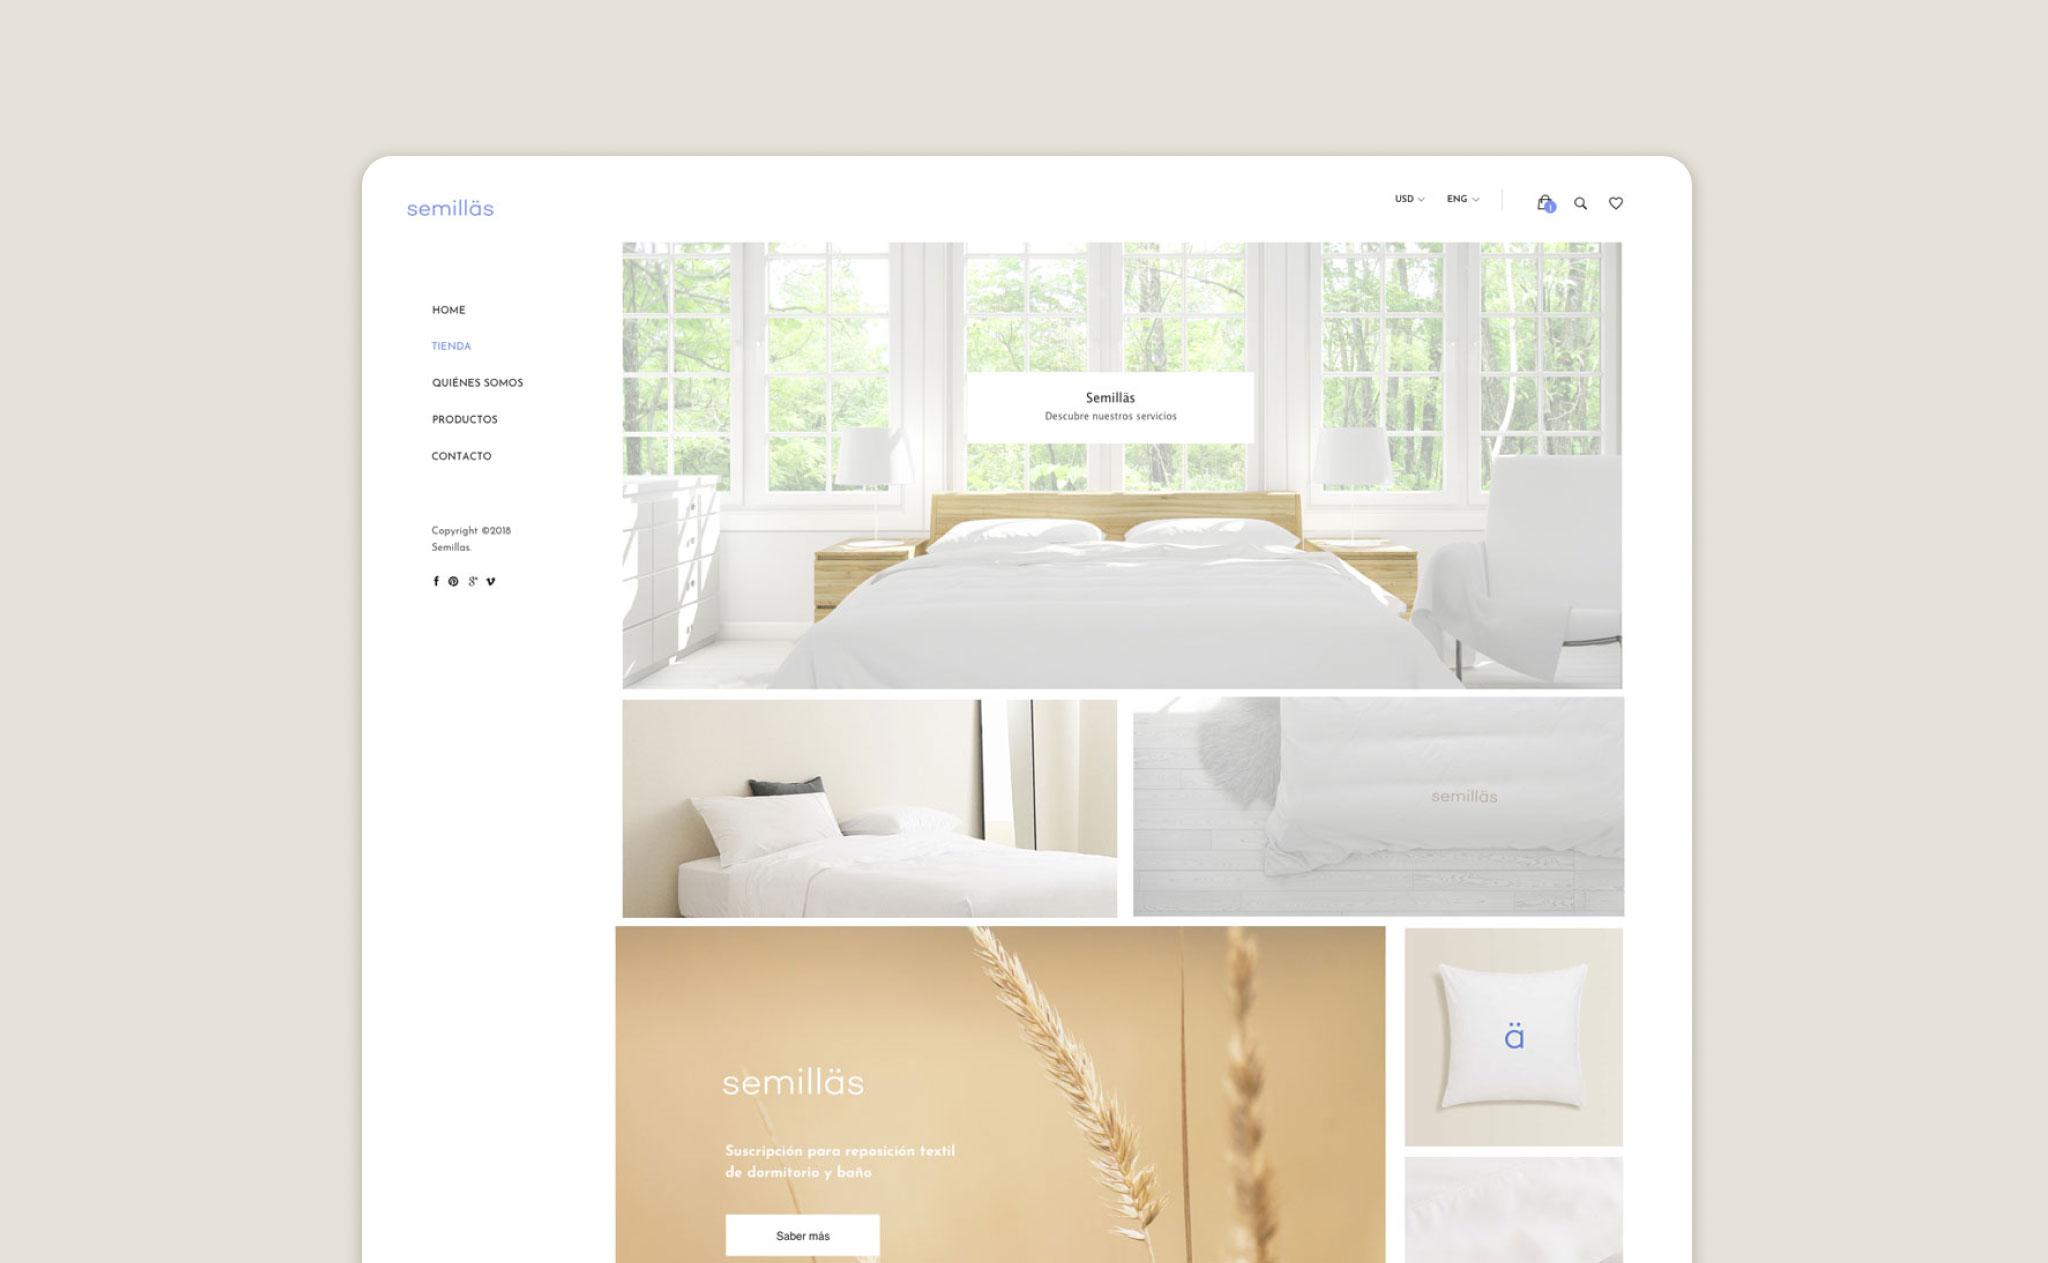 Mockup de la web de Semillas.